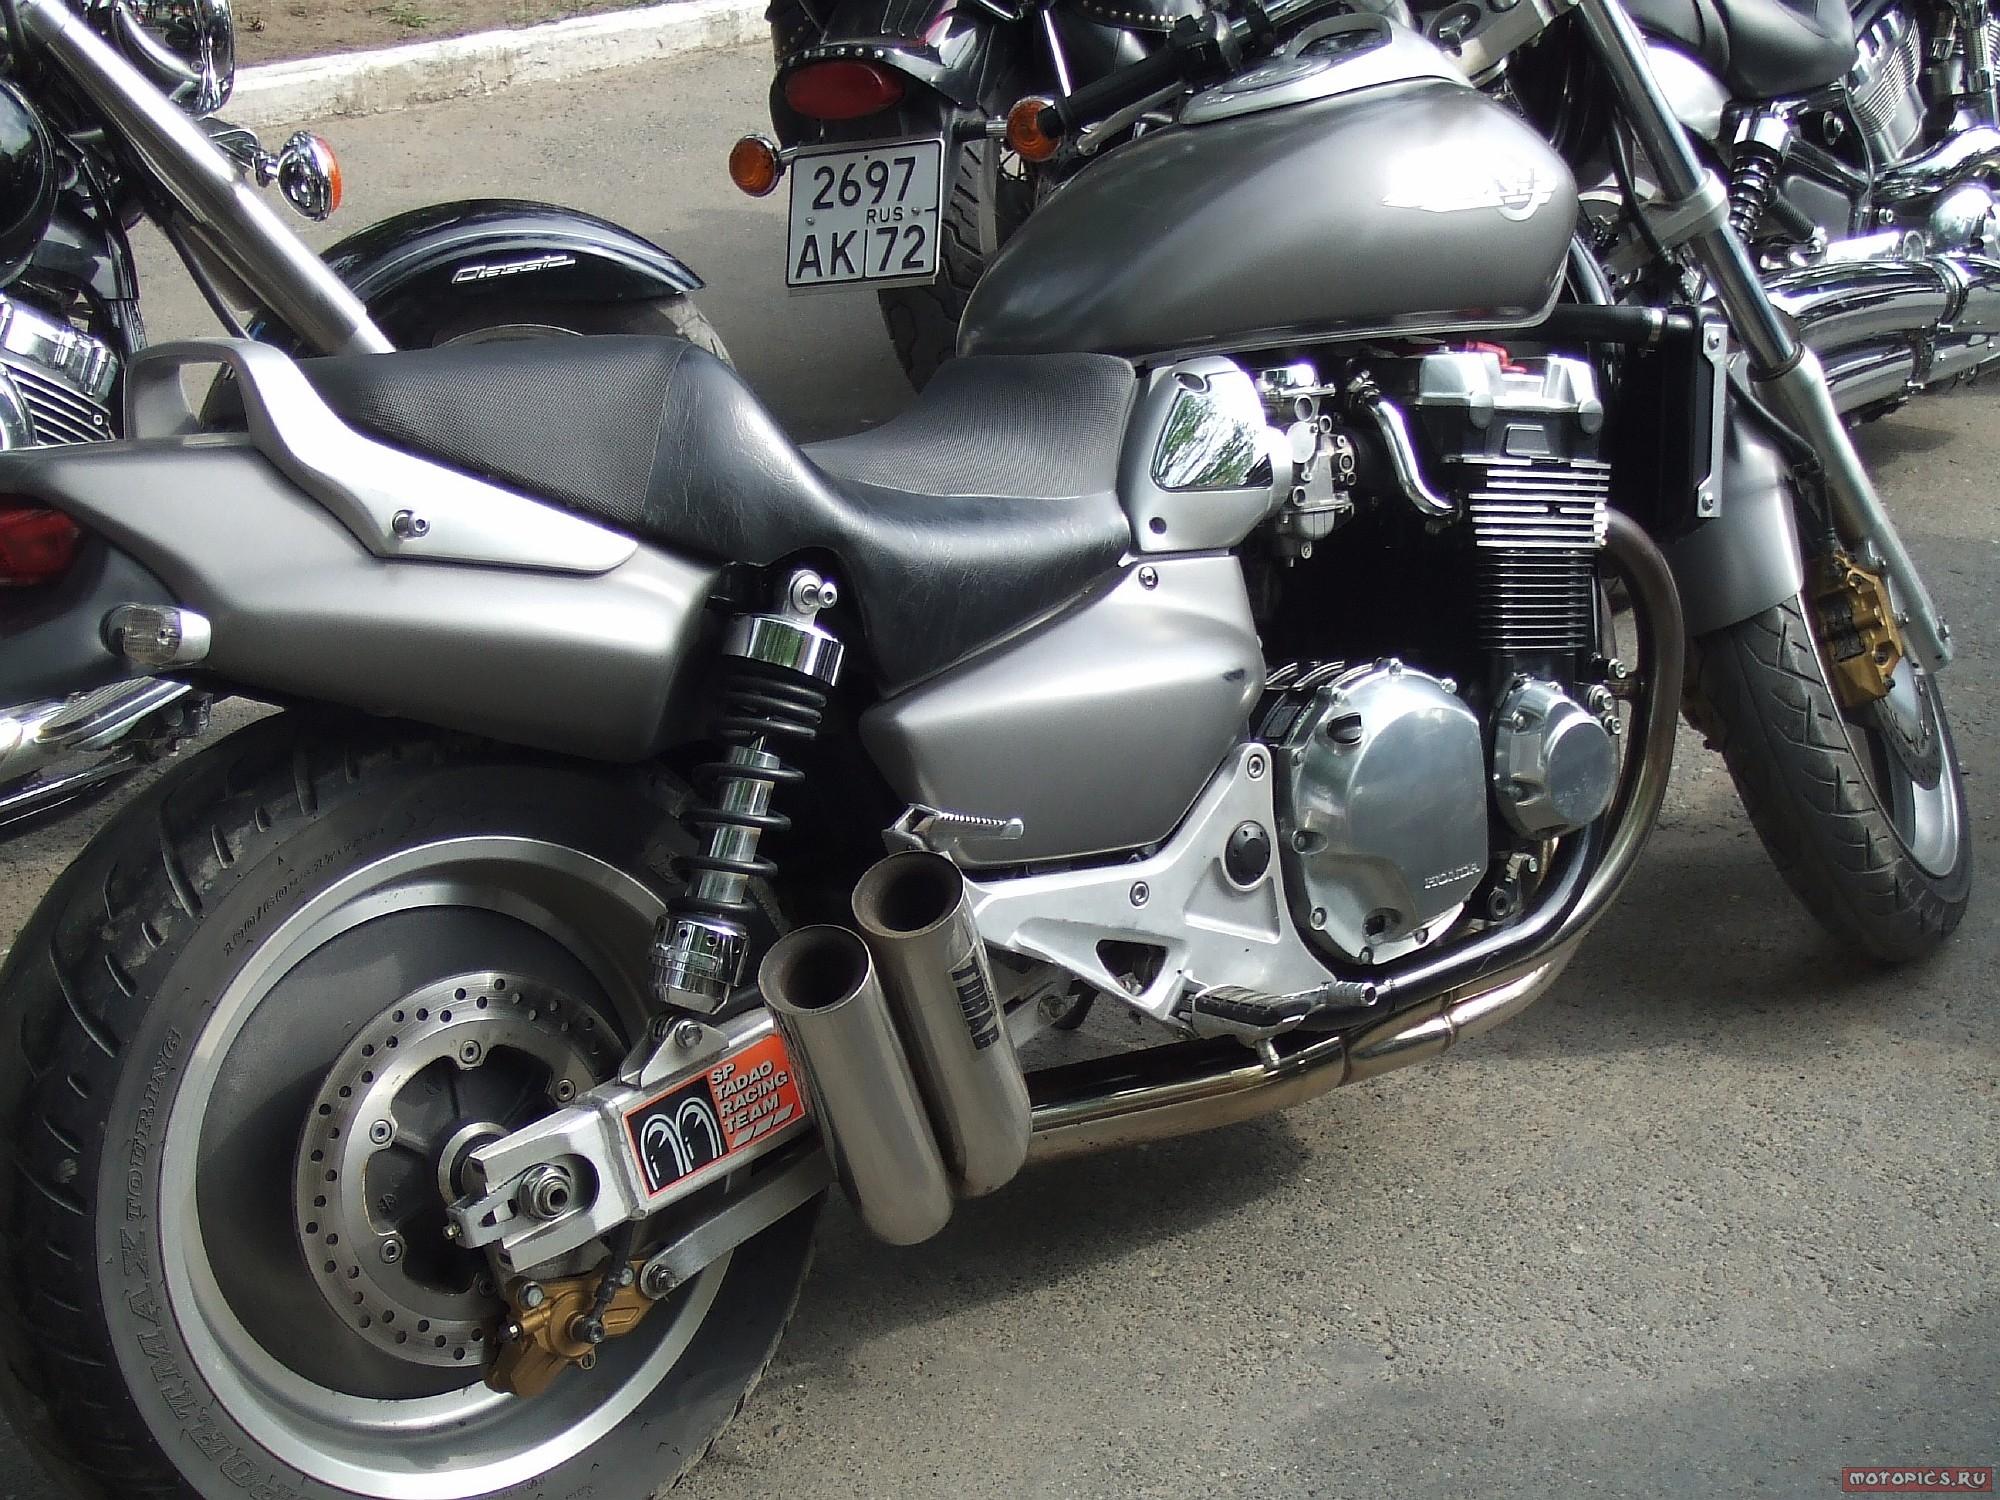 HONDA X4 black